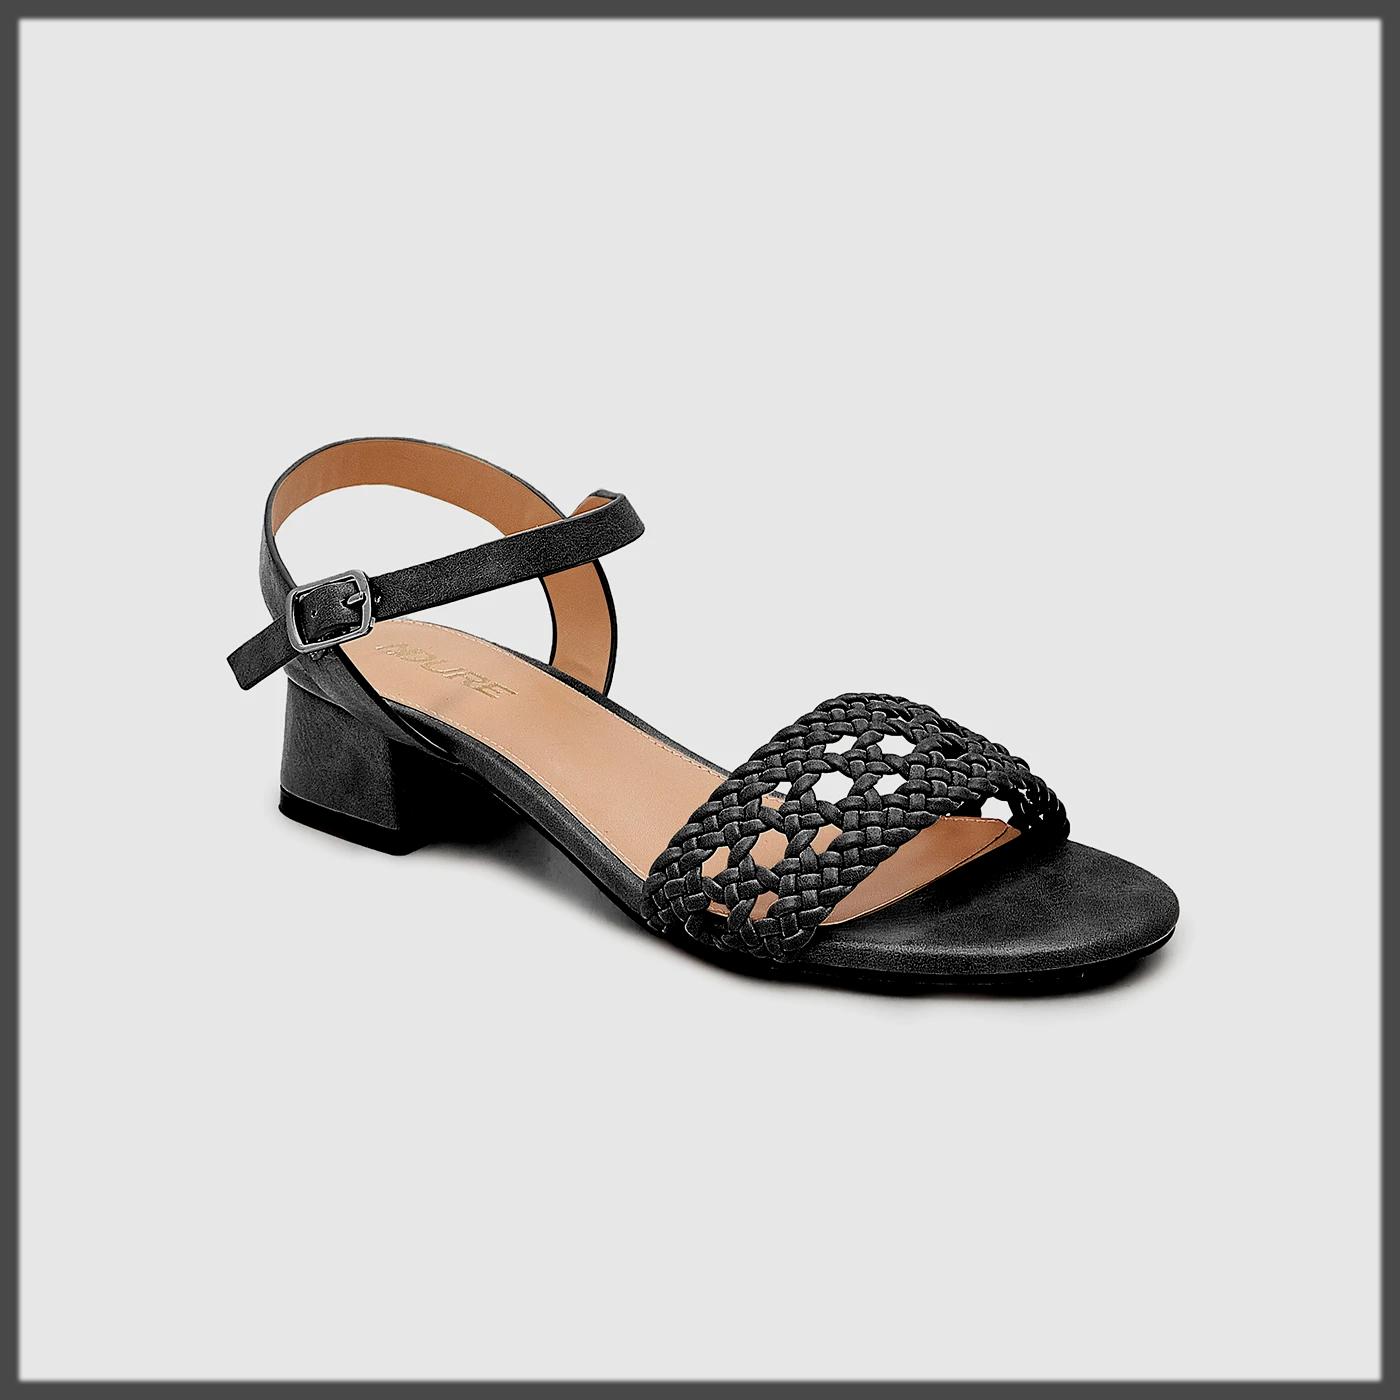 Basket Weave Women Sandals by Ndure